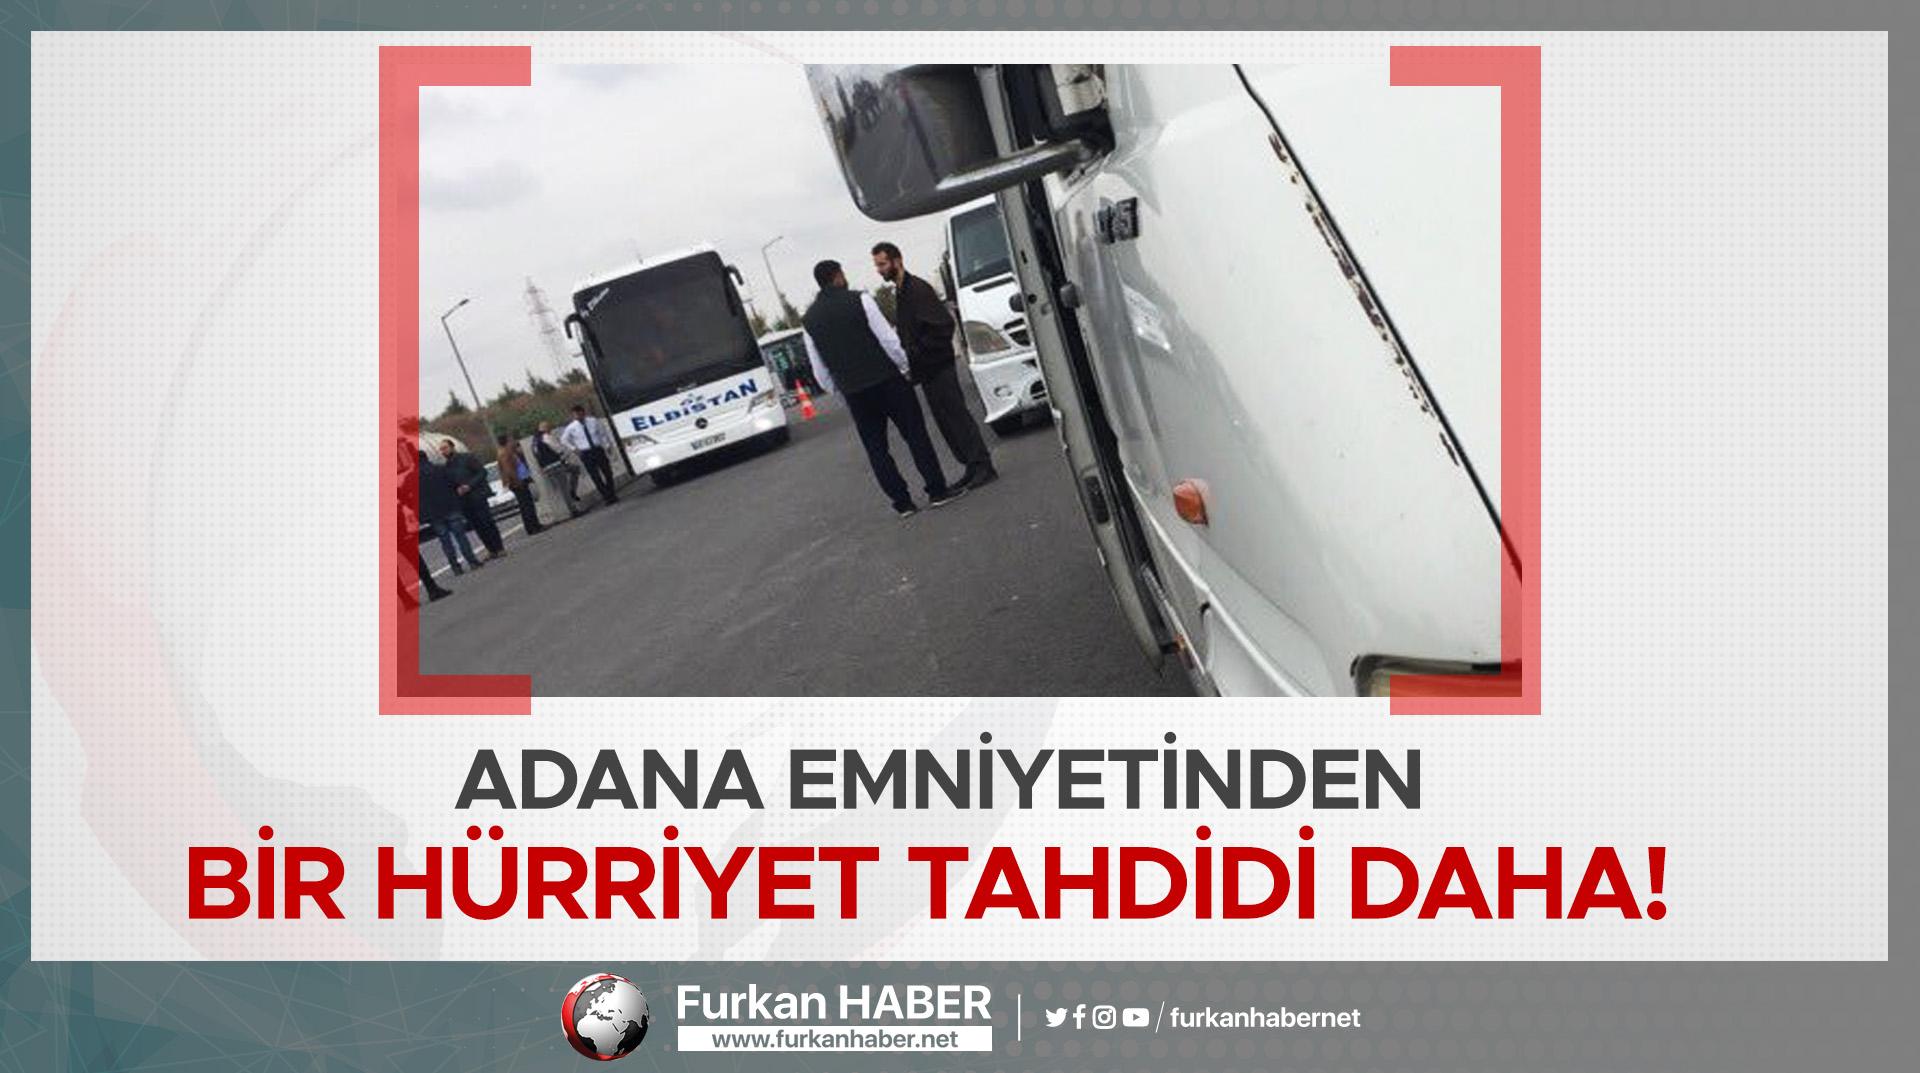 Adana Emniyetinden Bir Hürriyet Tahdidi Daha!